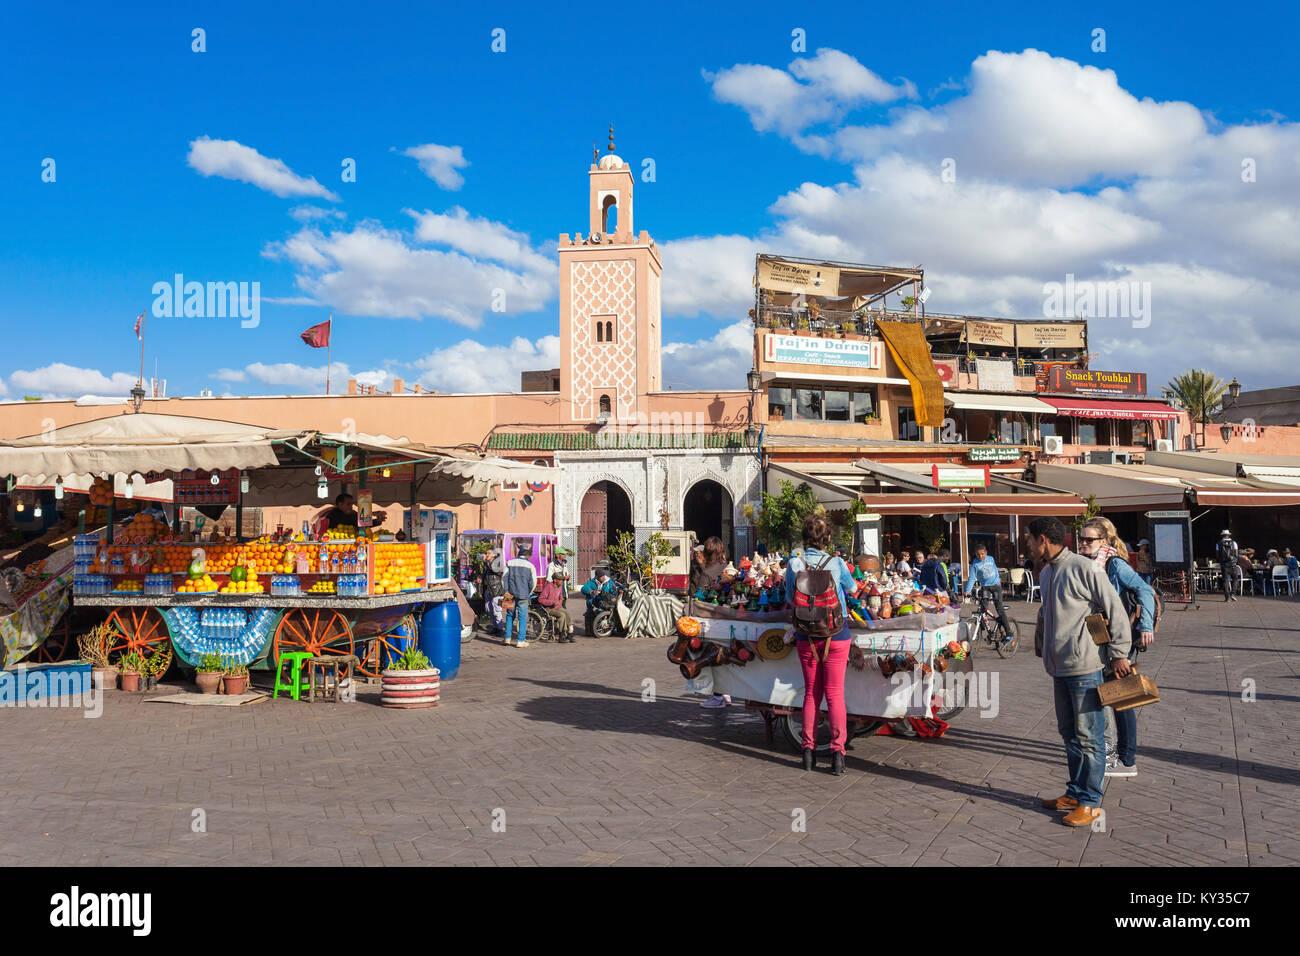 MARRAKECH, MOROCCO - FEBRUARY 22, 2016: Jemaa el Fna (also Jemaa el-Fnaa, Djema el-Fna or Djemaa el-Fnaa) is a square Stock Photo